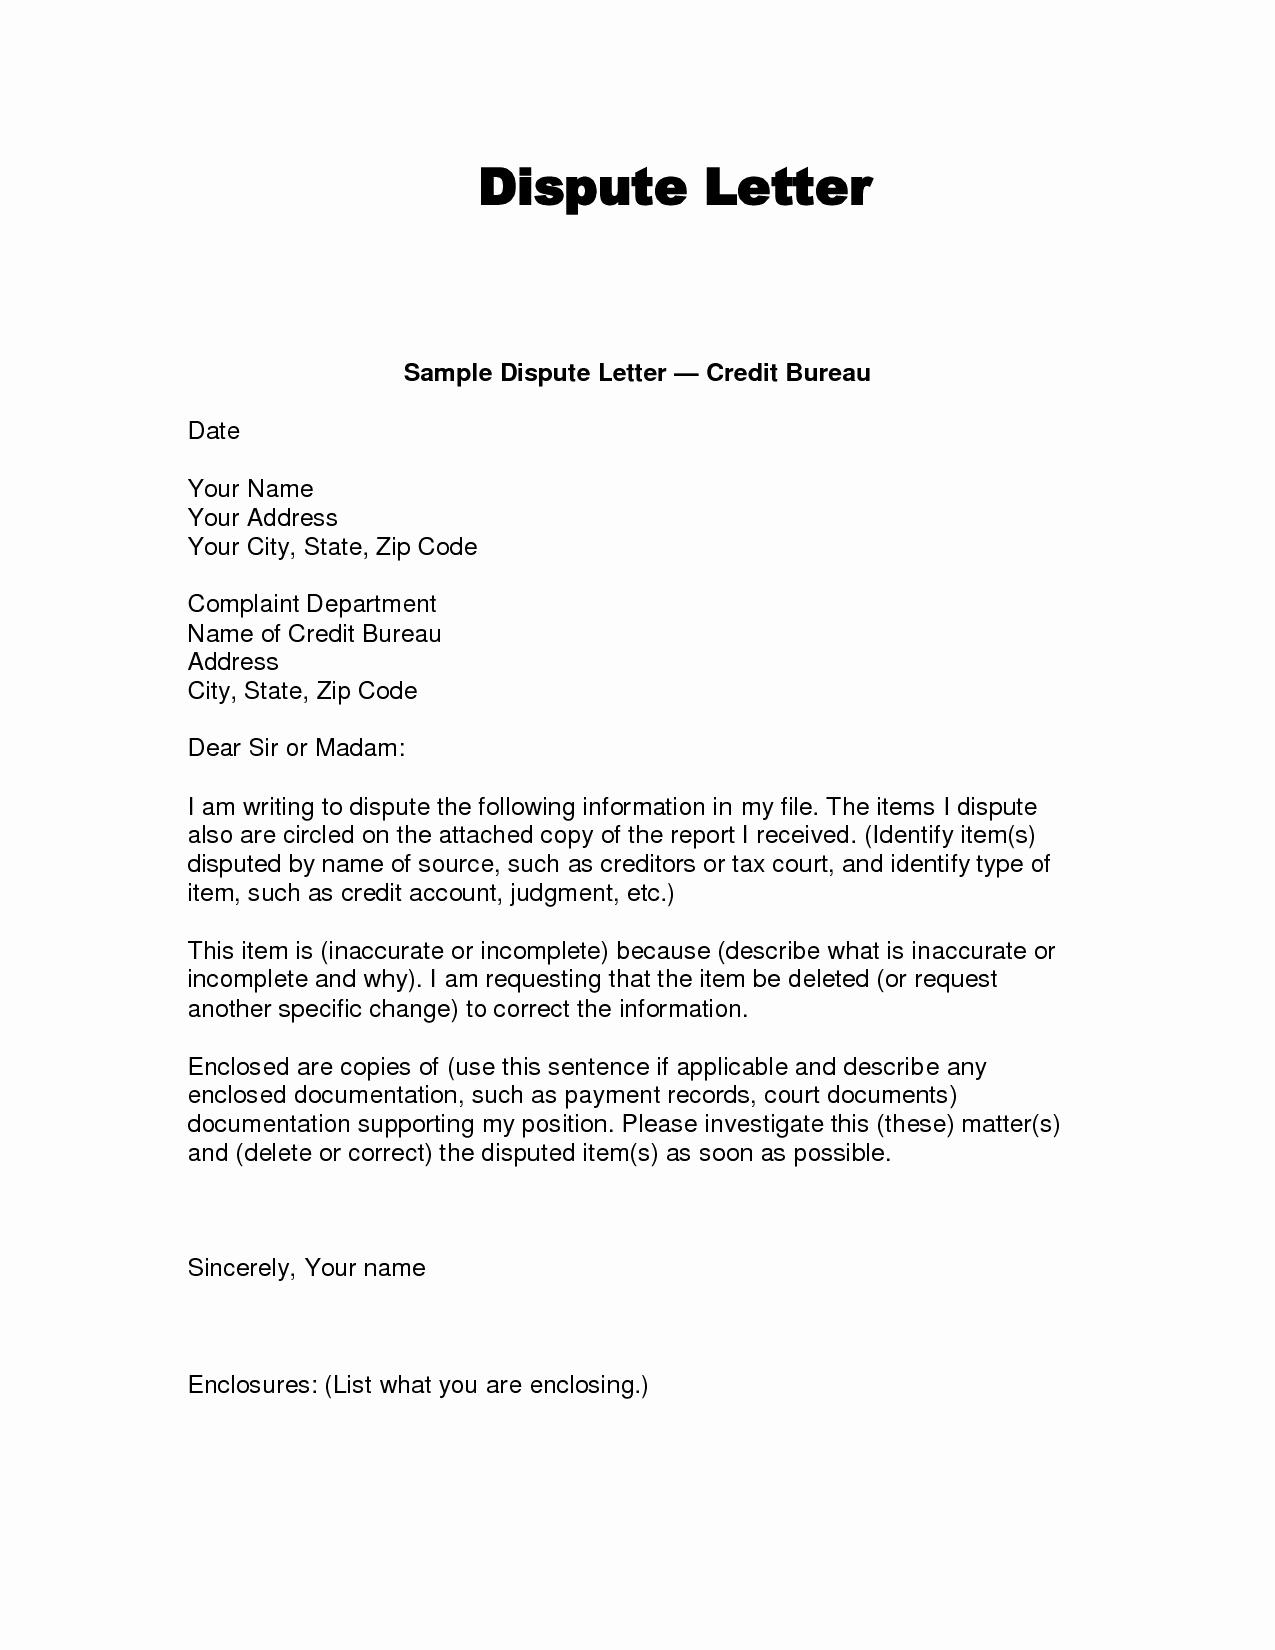 Sample Credit Repair Letter Lovely Writing Dispute Letter format Make A Habit 2019